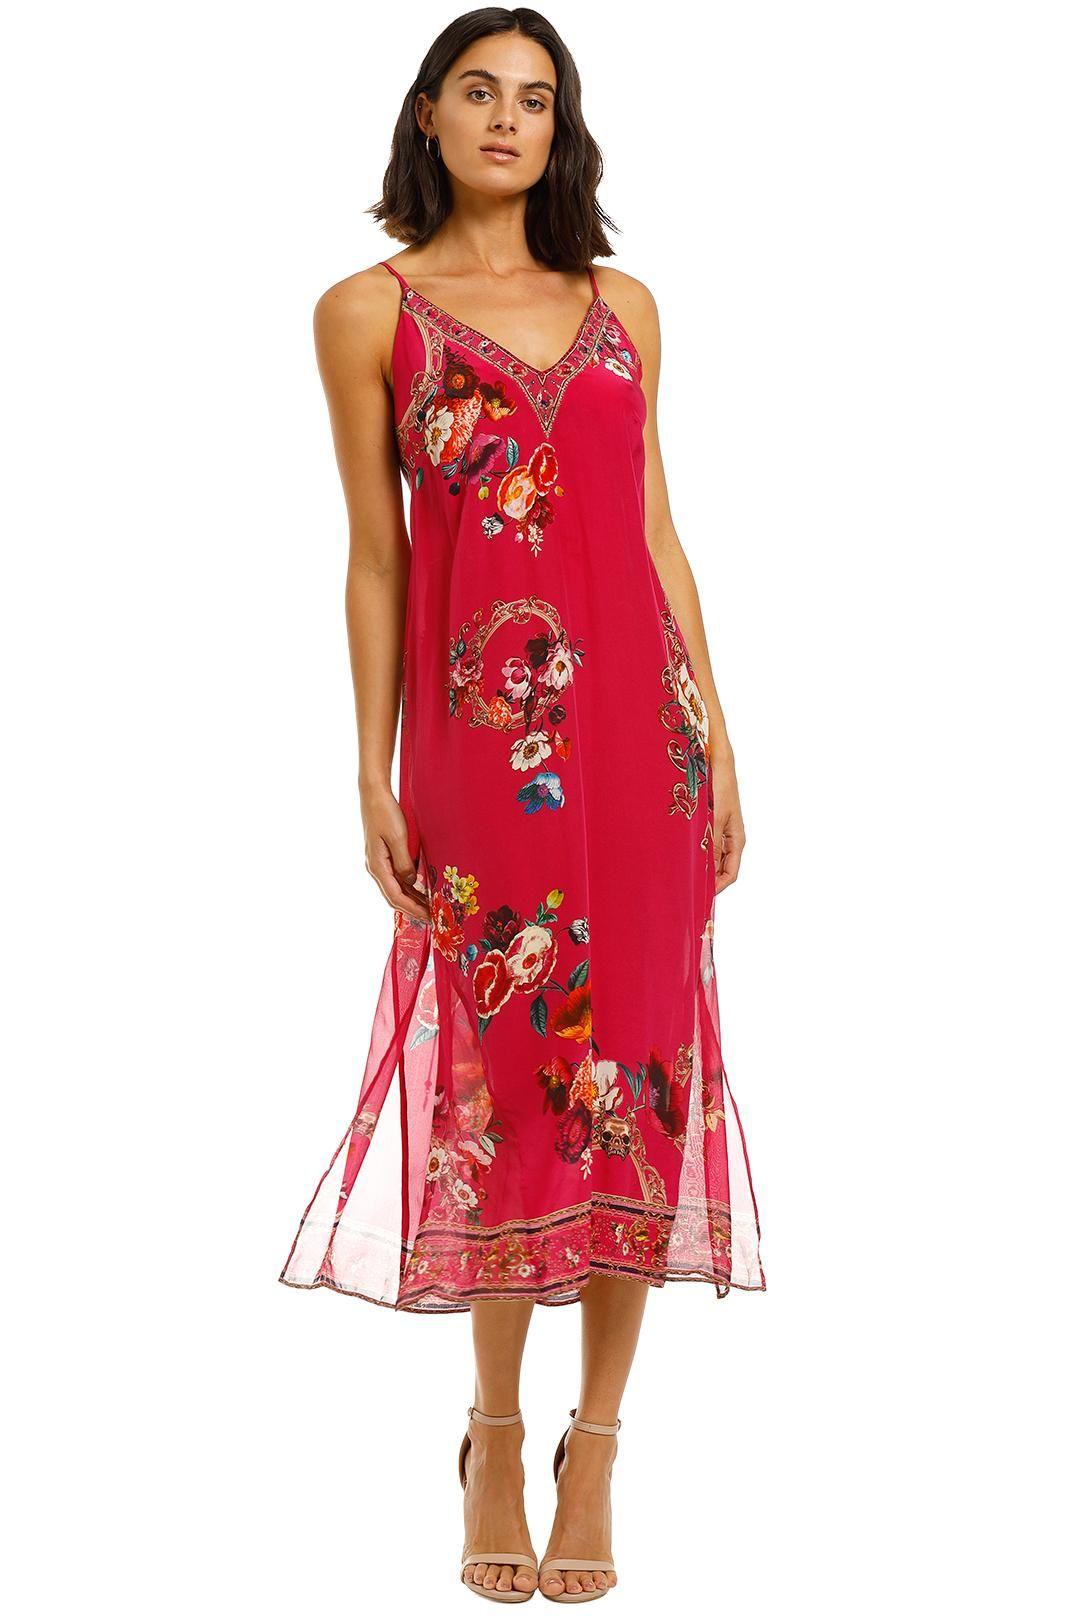 Camilla Lace Up Slip With Sheer Panel Dress Midi